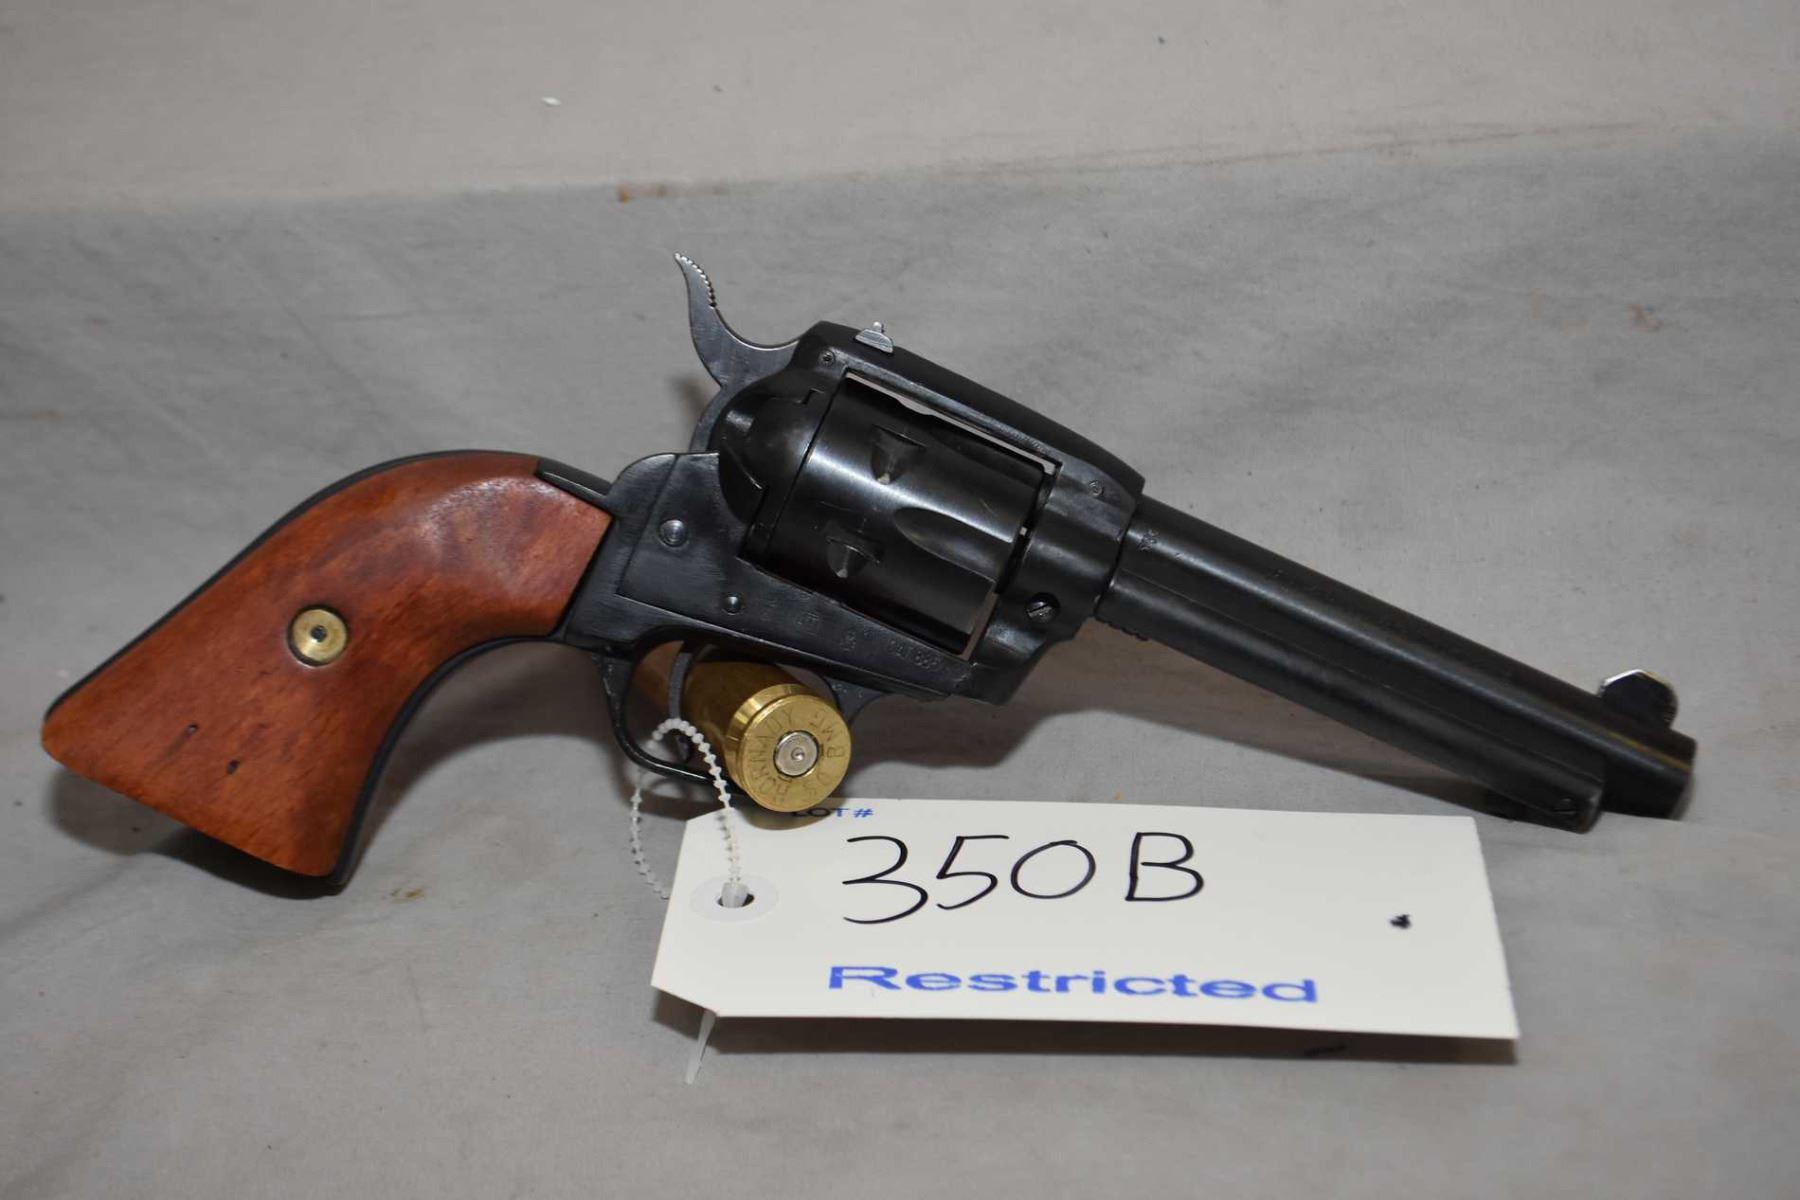 Restricted - Tanfoglio Model TA76  22 LR Cal 6 Shot Revolver w